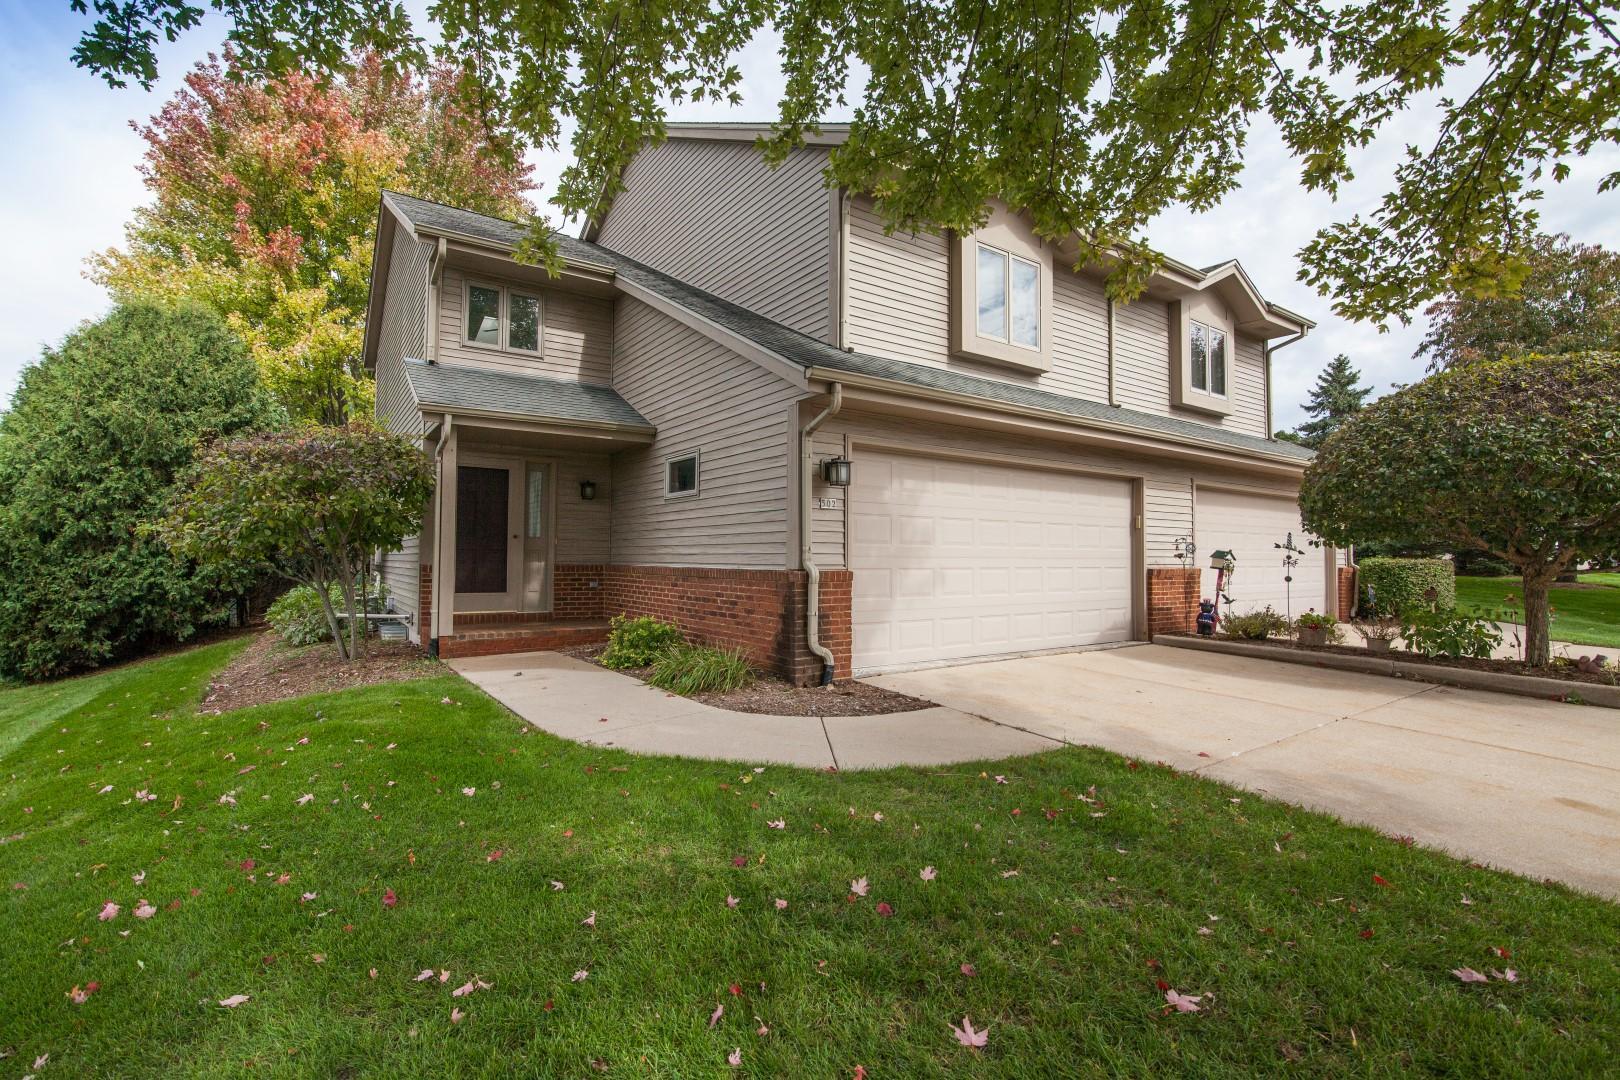 502 Frederick Ct, Oconomowoc, Wisconsin 53066, 2 Bedrooms Bedrooms, 7 Rooms Rooms,2 BathroomsBathrooms,Condominiums,For Sale,Frederick Ct,1,1609337